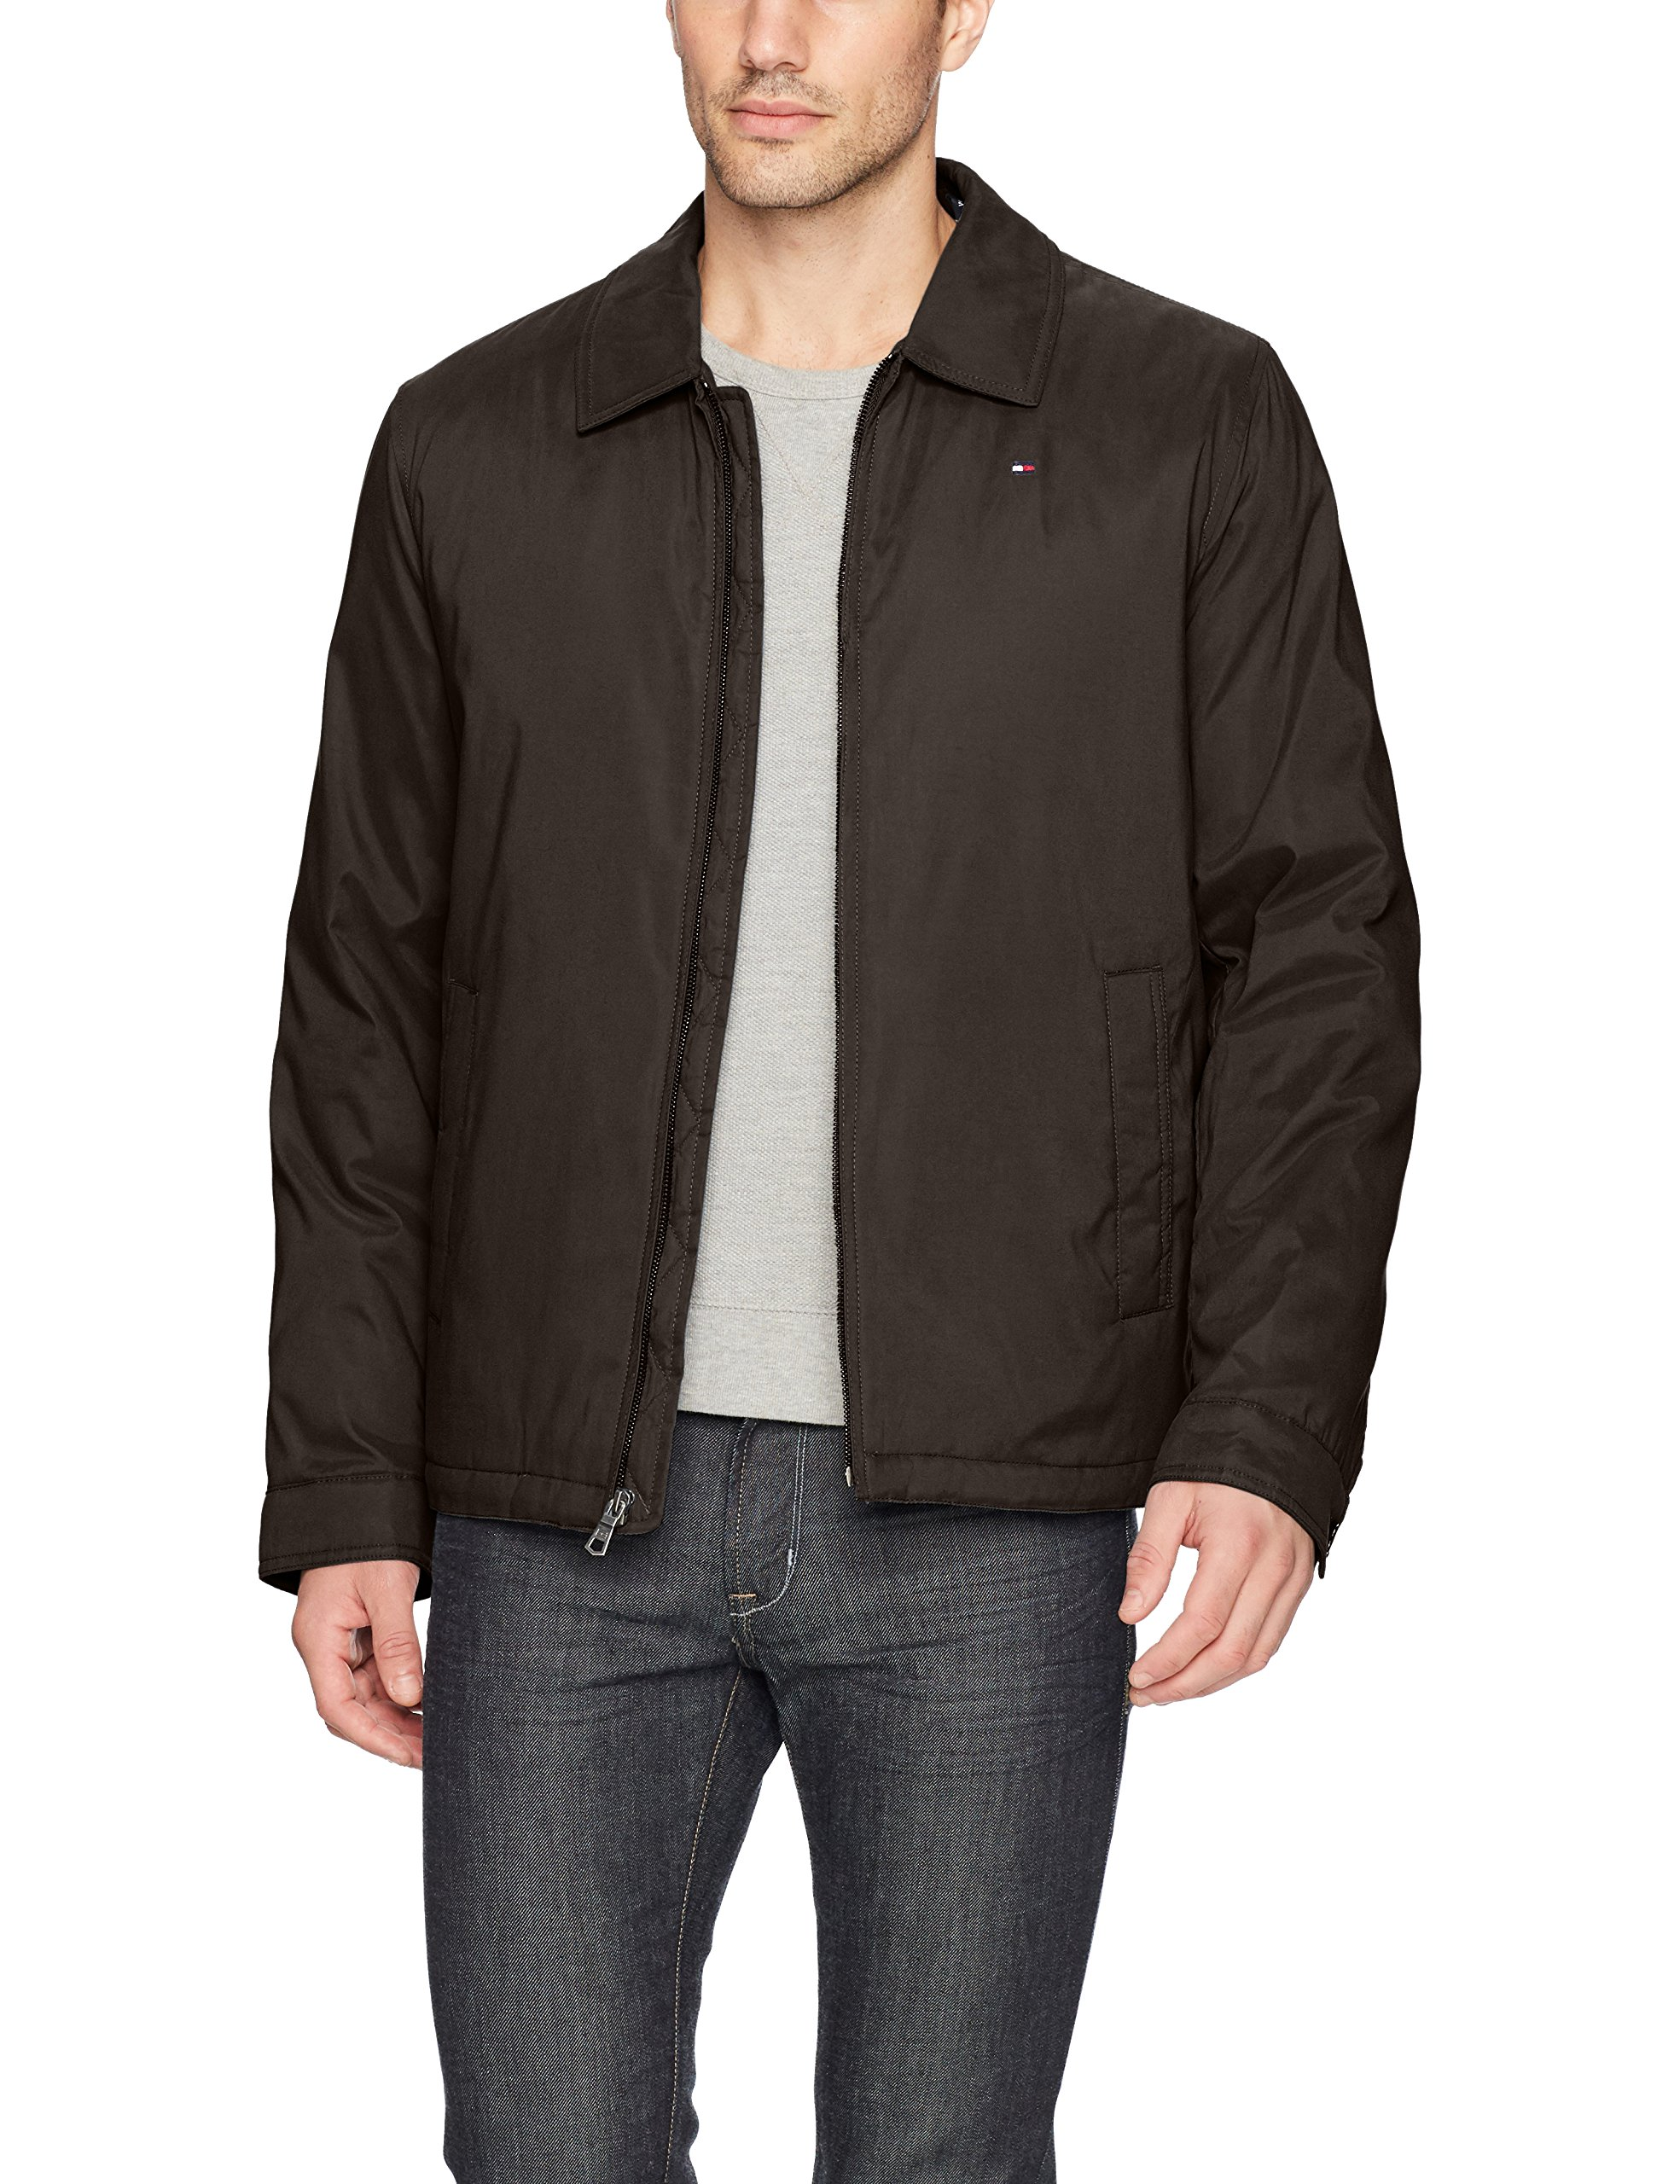 Tommy Hilfiger Men's Micro-Twill Open-Bottom Zip-Front Jacket, Dark Brown, XX-Large by Tommy Hilfiger